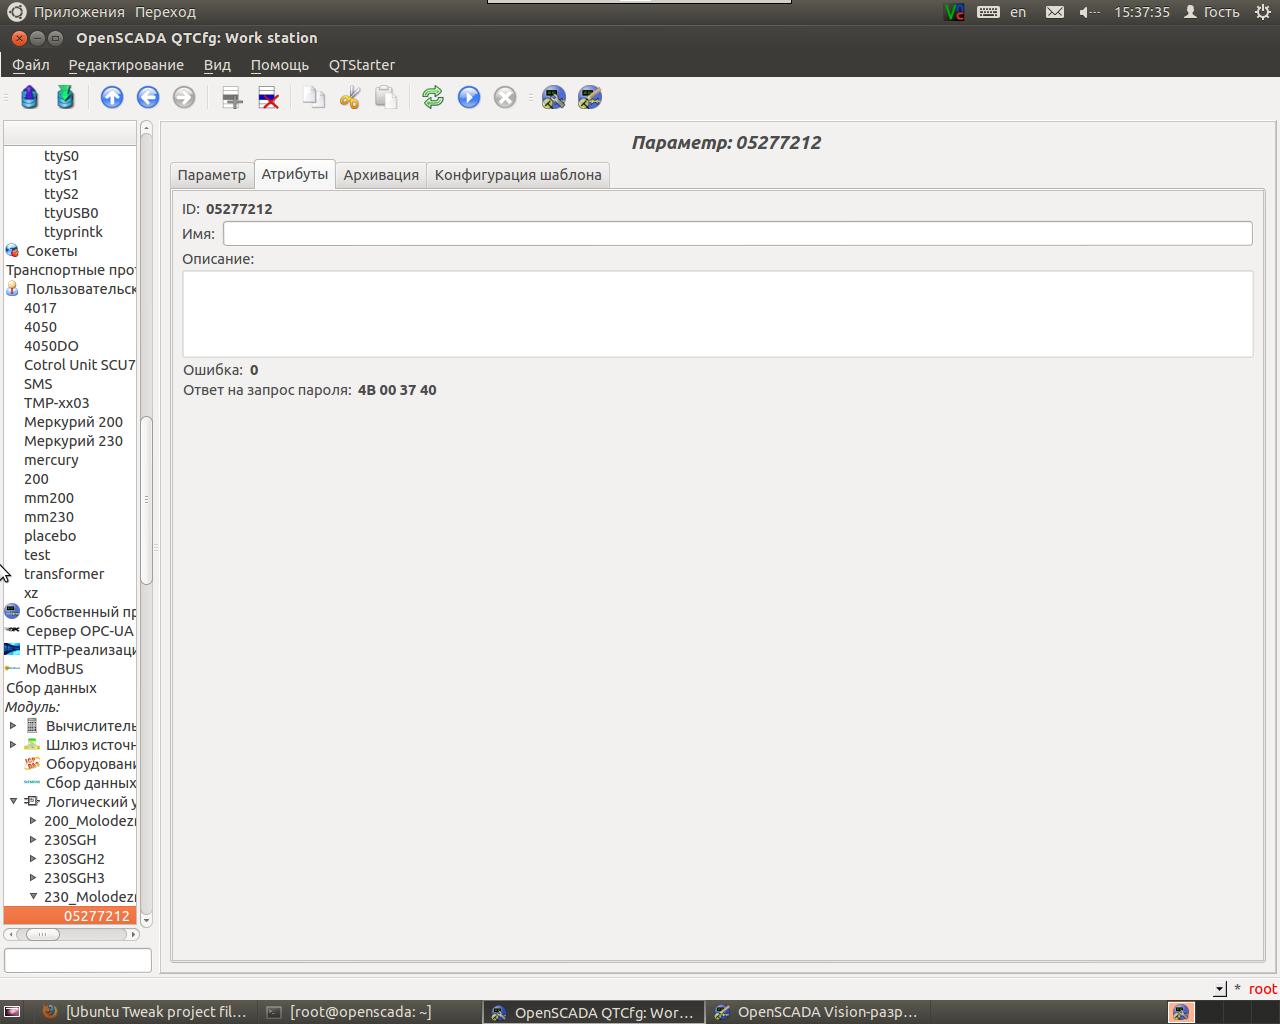 Пишем протоколы счетчиков Меркурий 230 и Меркурий 200 для OpenSCADA - 11